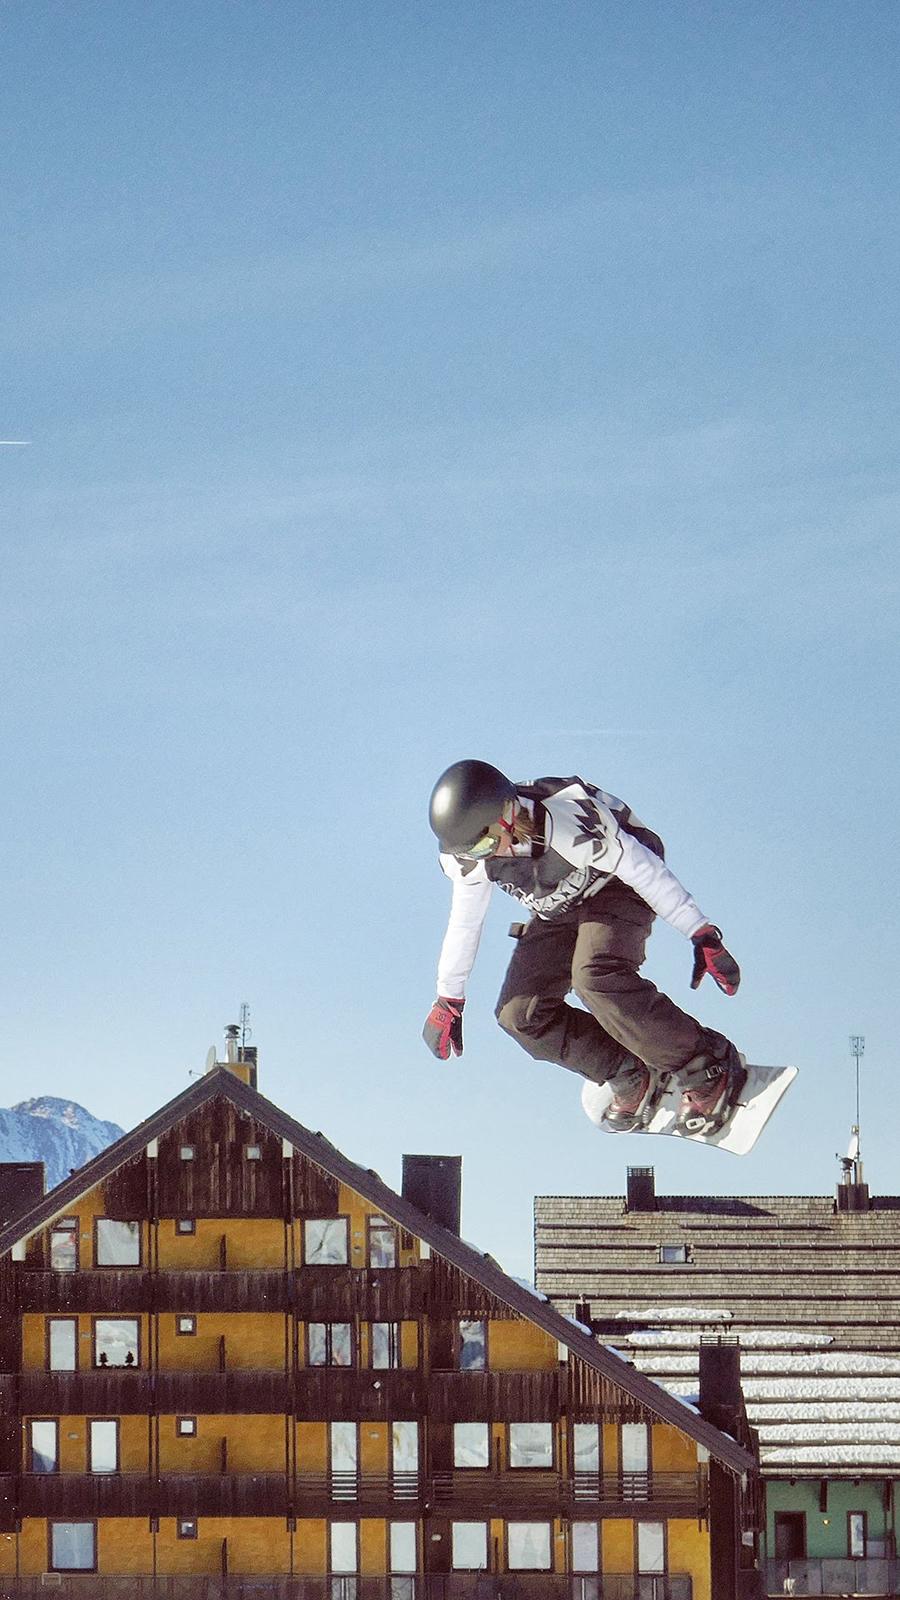 Ski Wallpapers – Ski Wallpaper Free Download